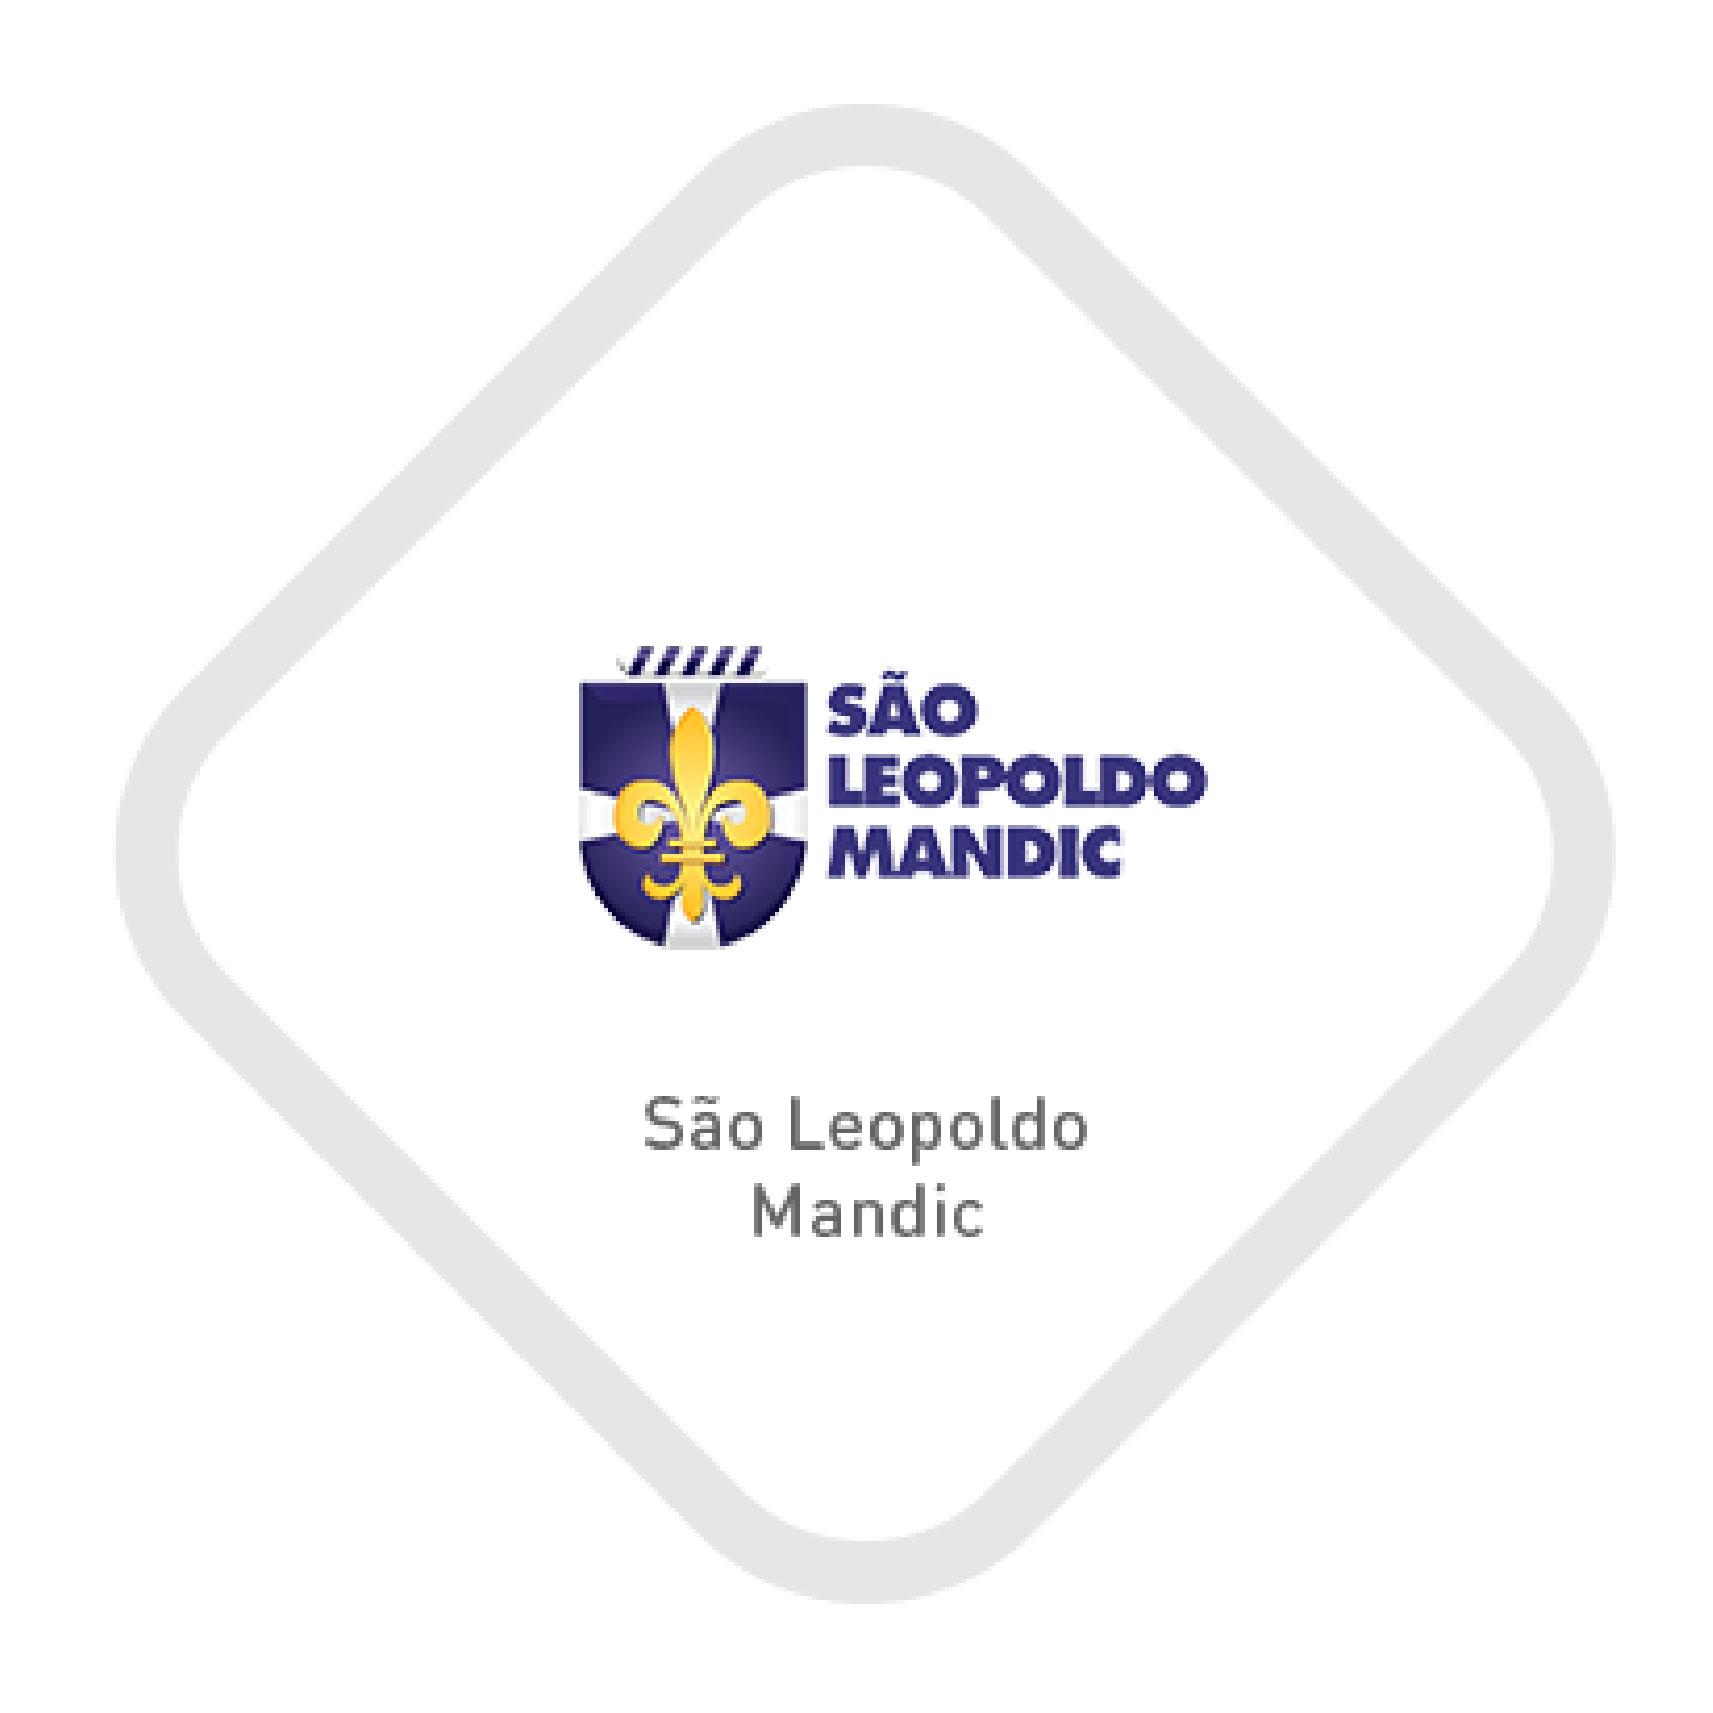 sao-leopoldo-mandic